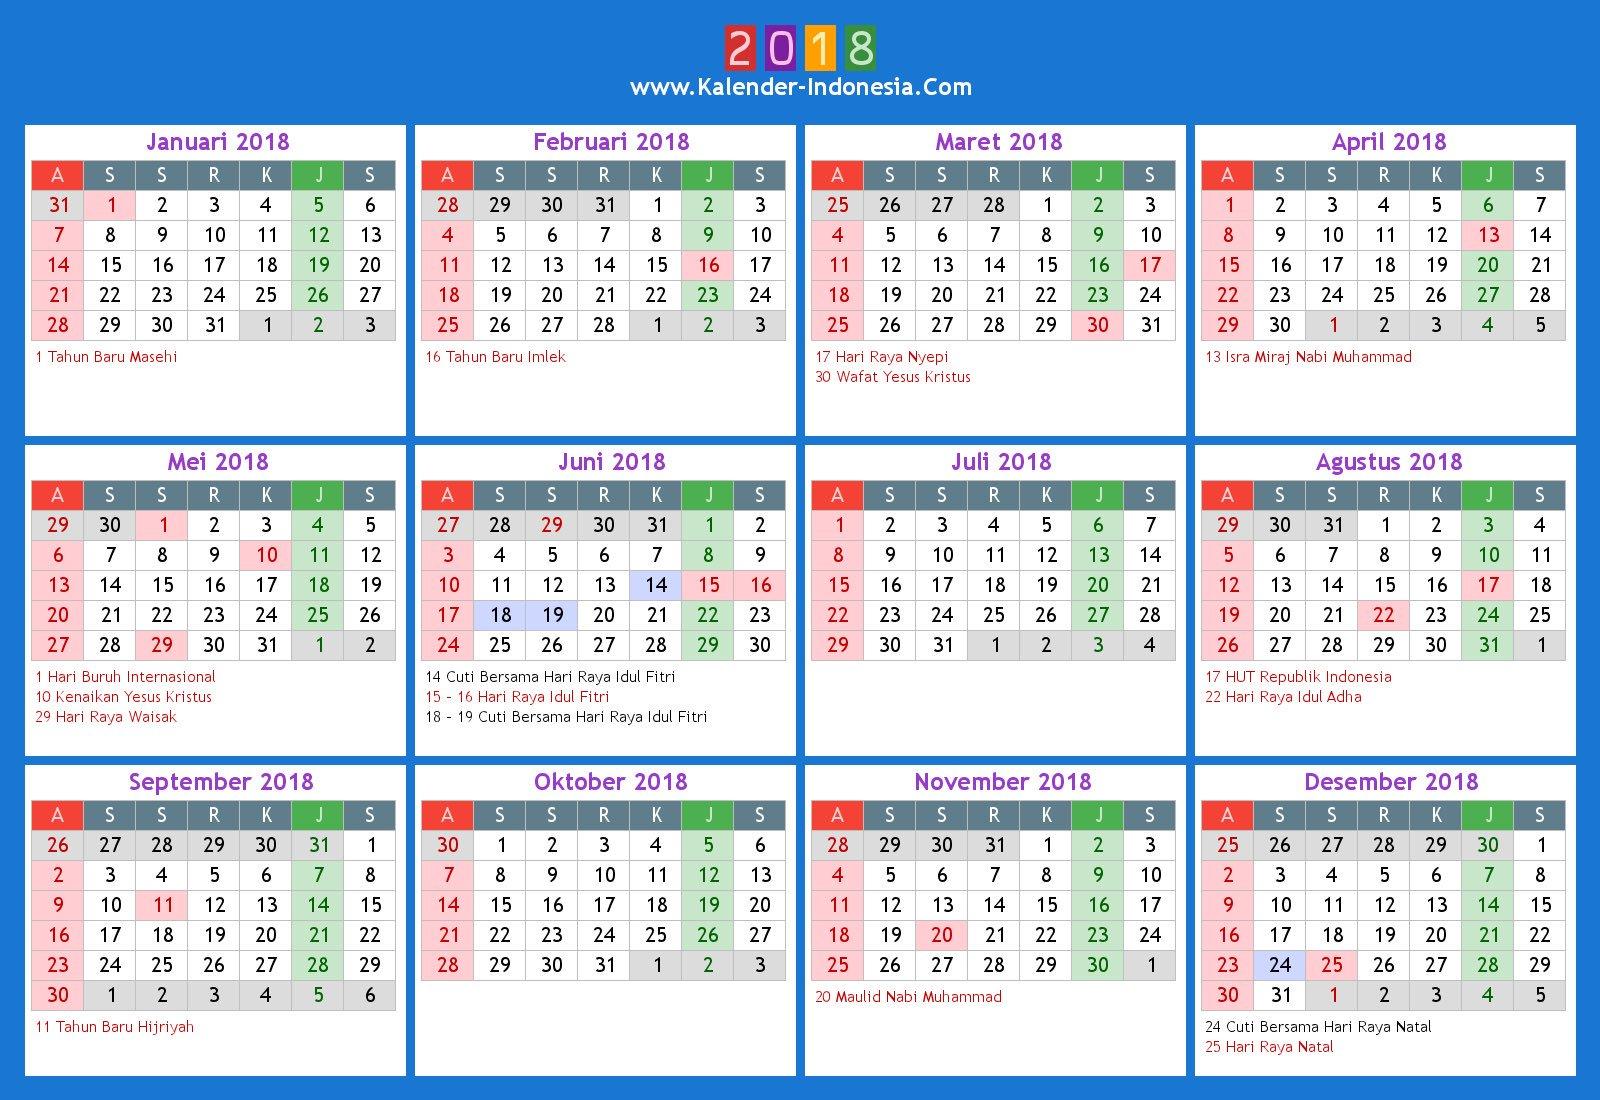 "KartuPos on Twitter: ""Kalender Indonesia 2018 lengkap ..."